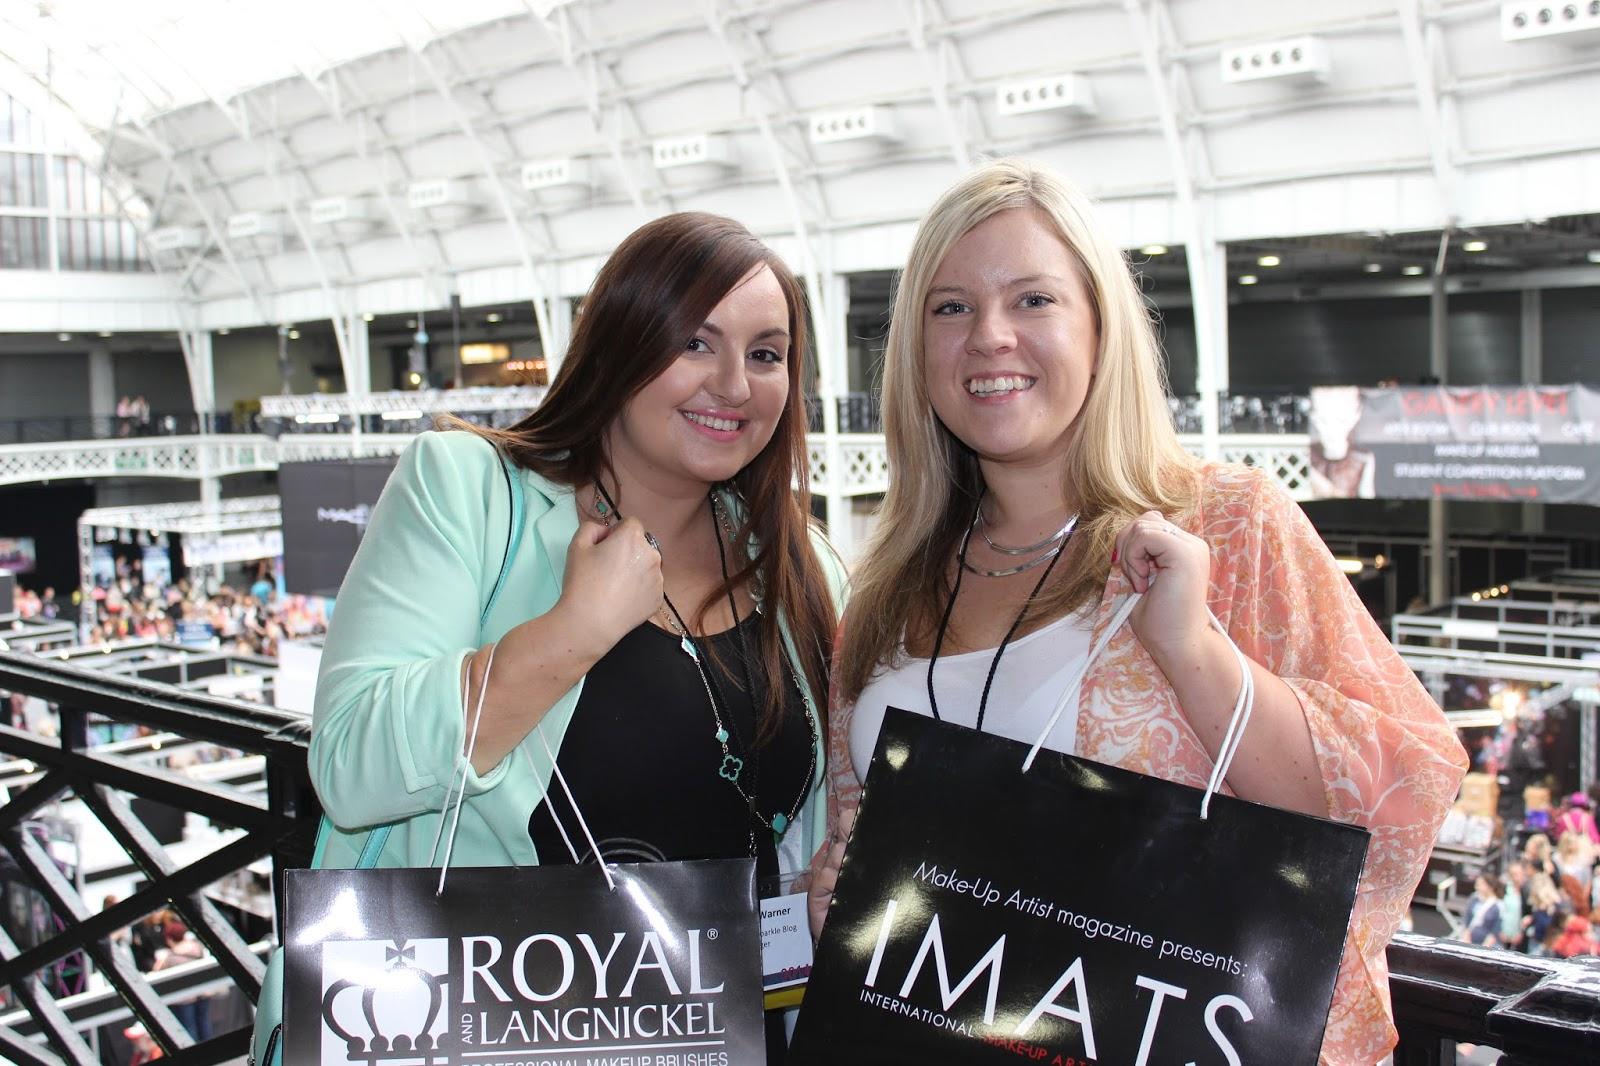 IMATS london 2014 bloggers